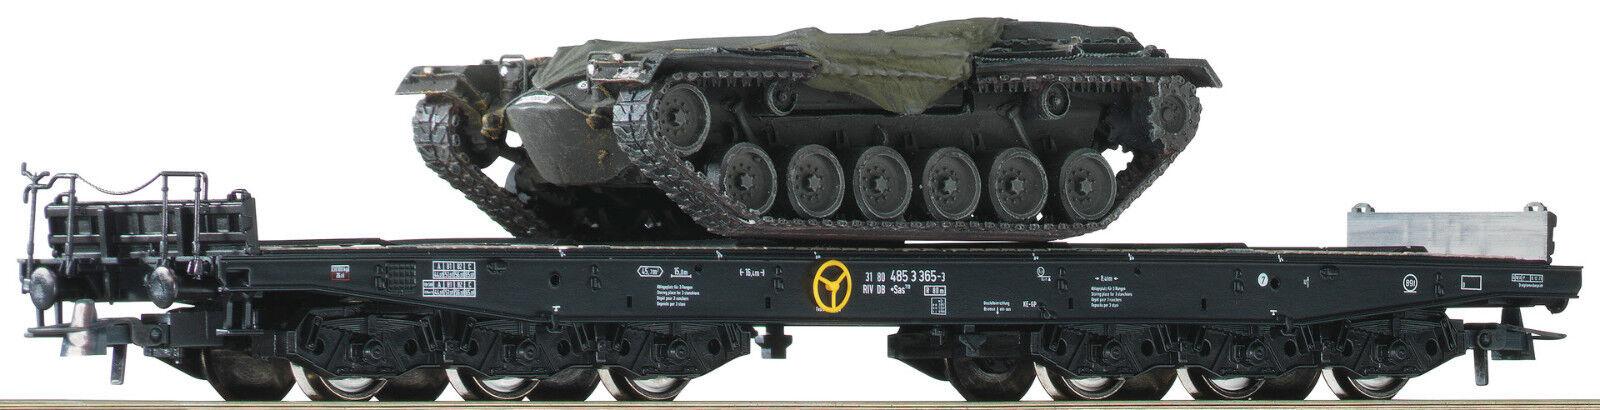 76161 - Roco 2 piece set heavy duty flat wagons, DB, HO